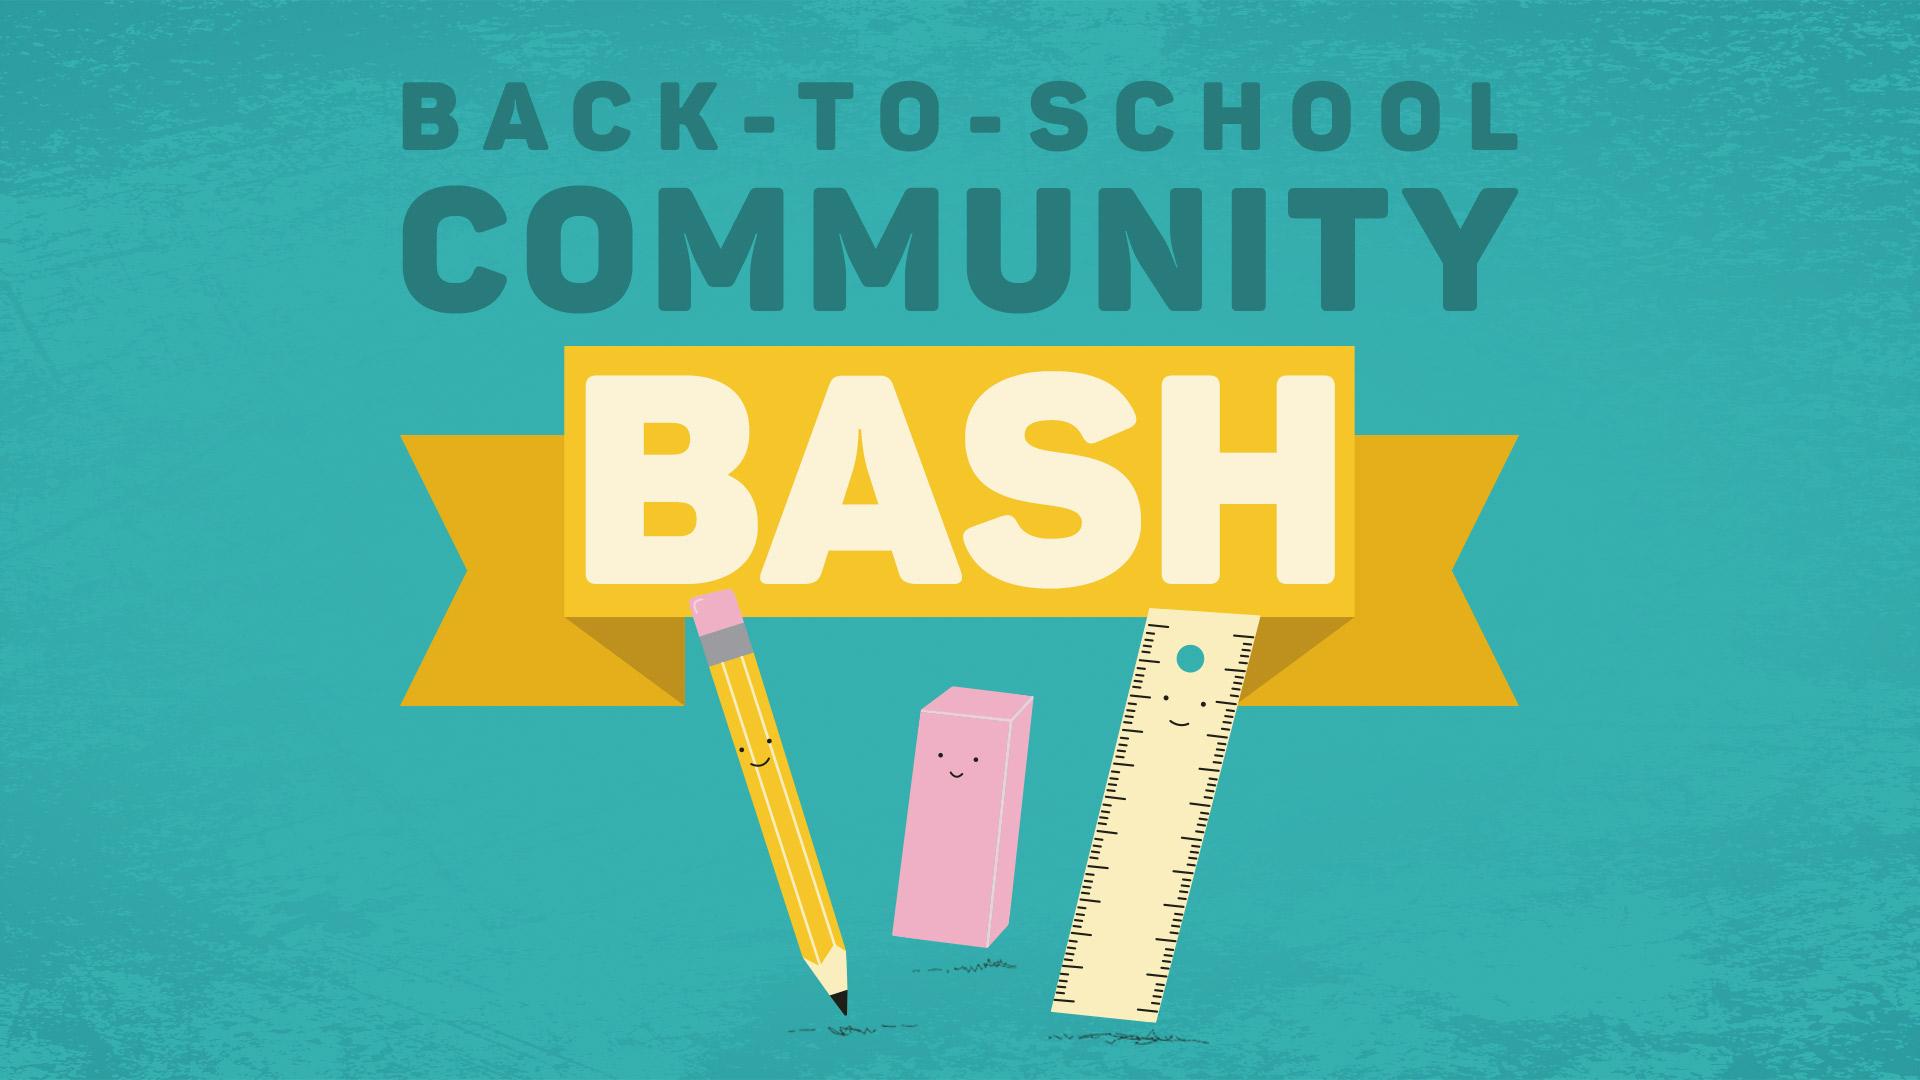 Back-to-School-Community-Bash-title.jpg